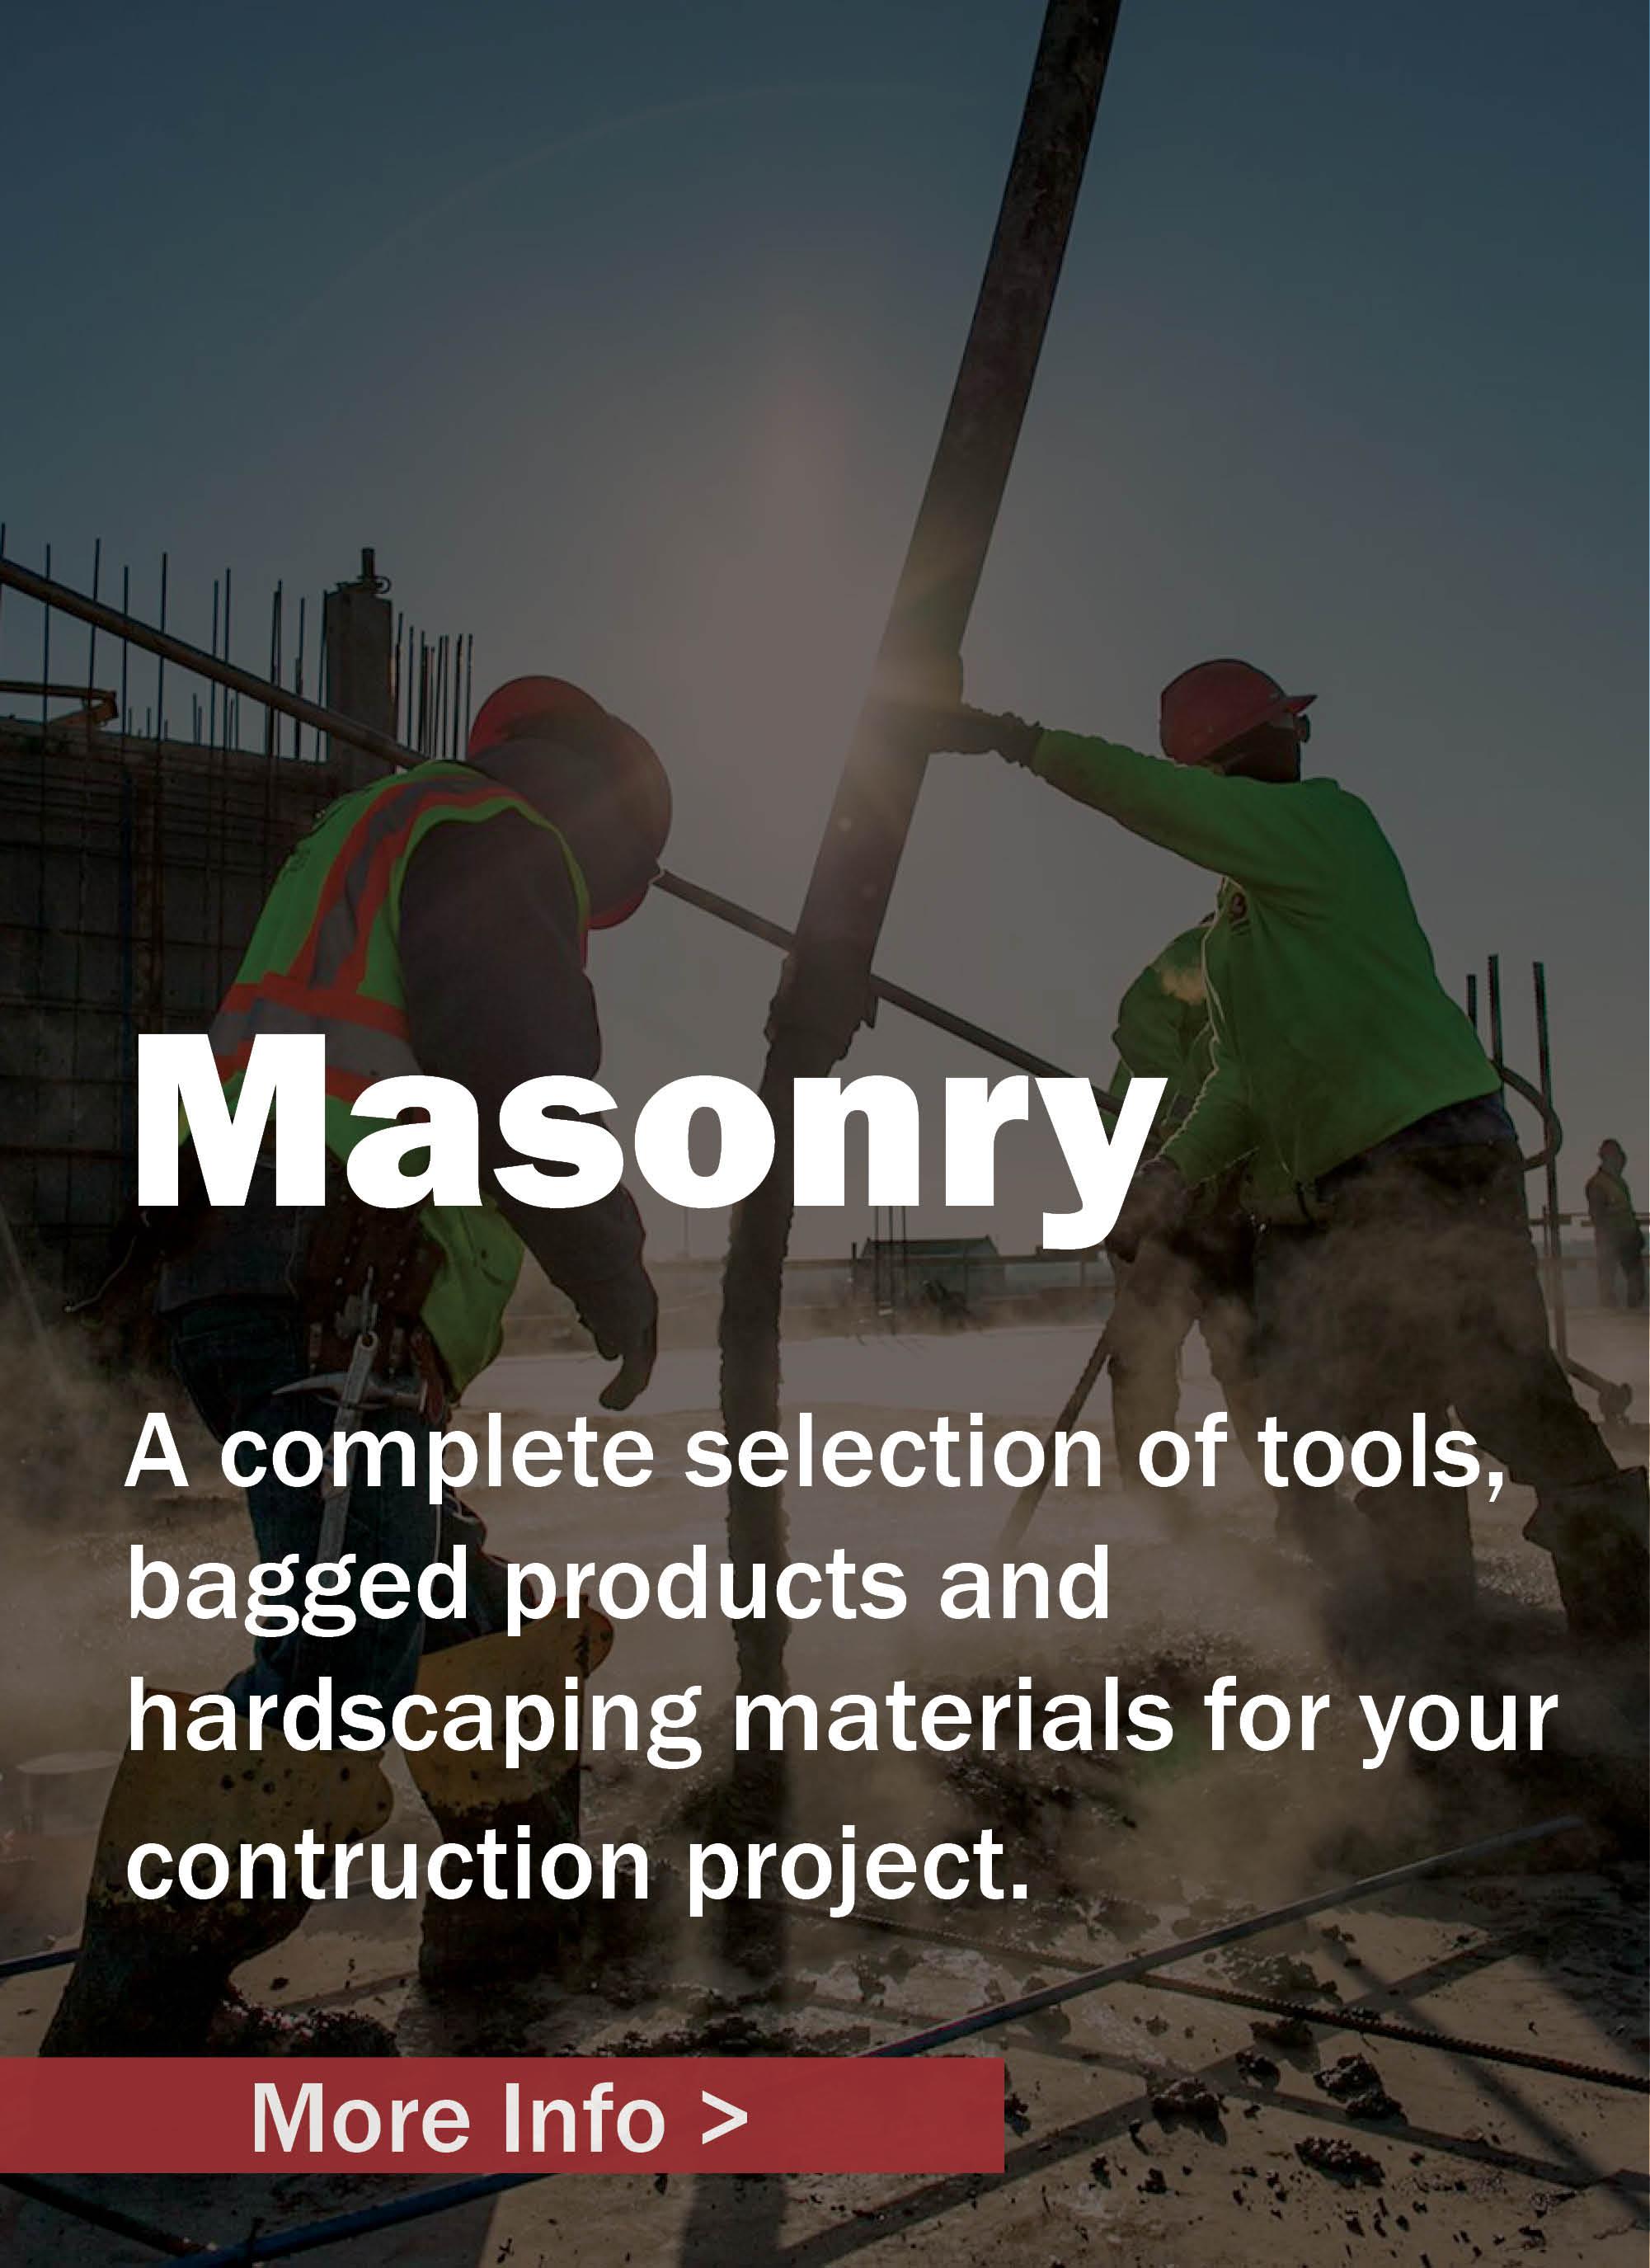 Masonry_Cranesville_Block.jpg